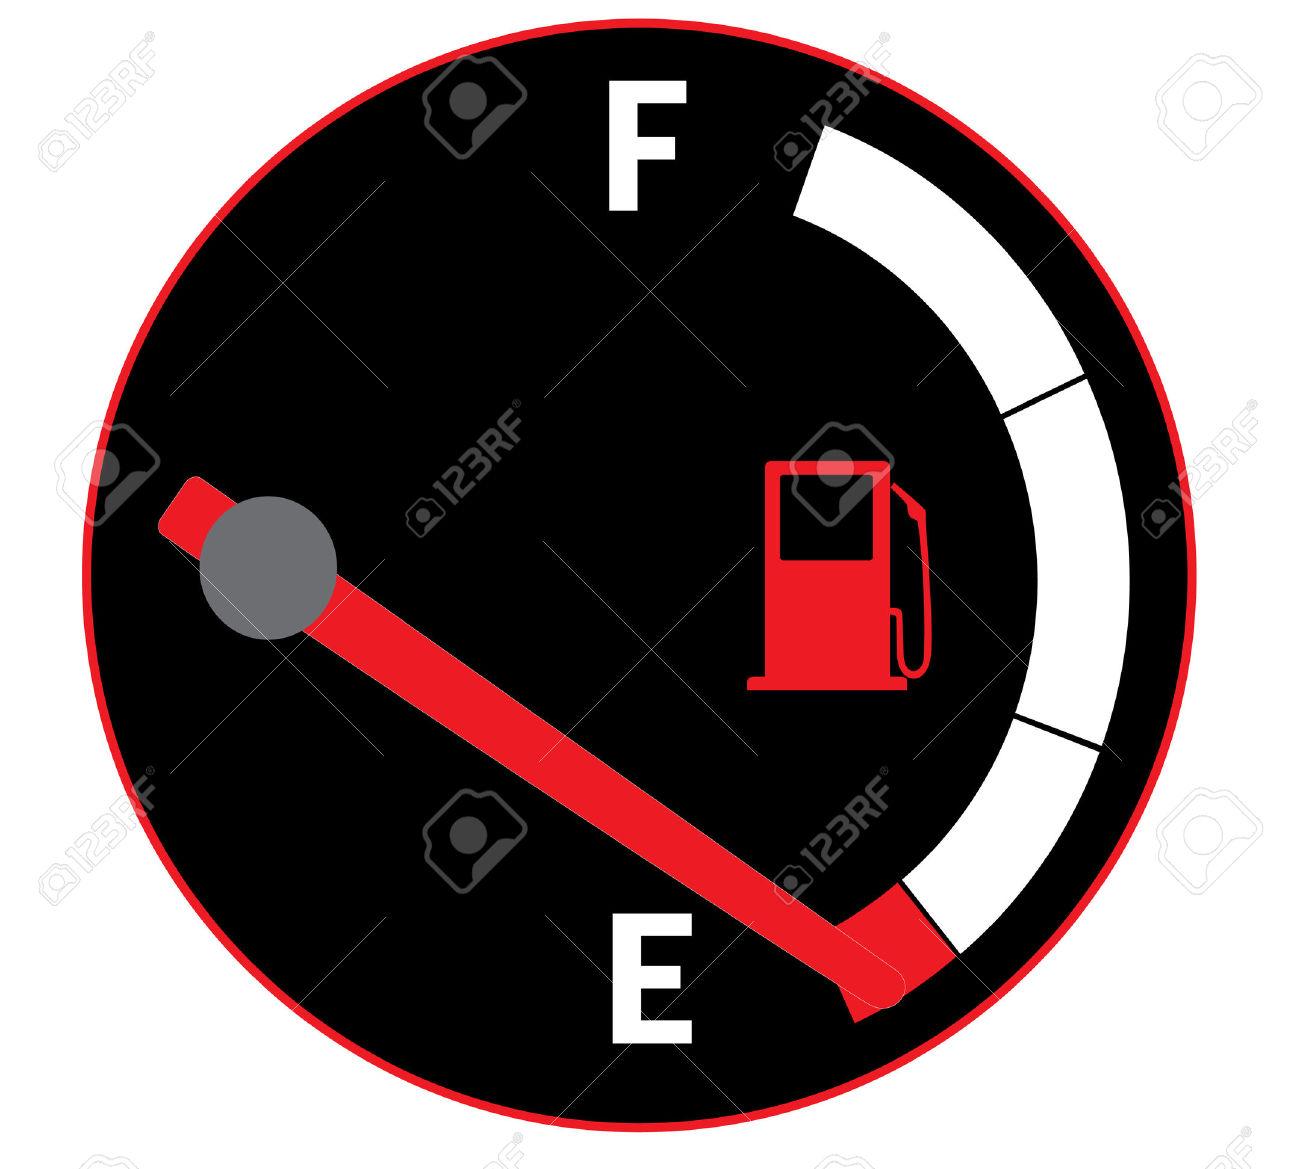 Vector Illustration Of Fuel Gauge On Car Dashboard Royalty Free.